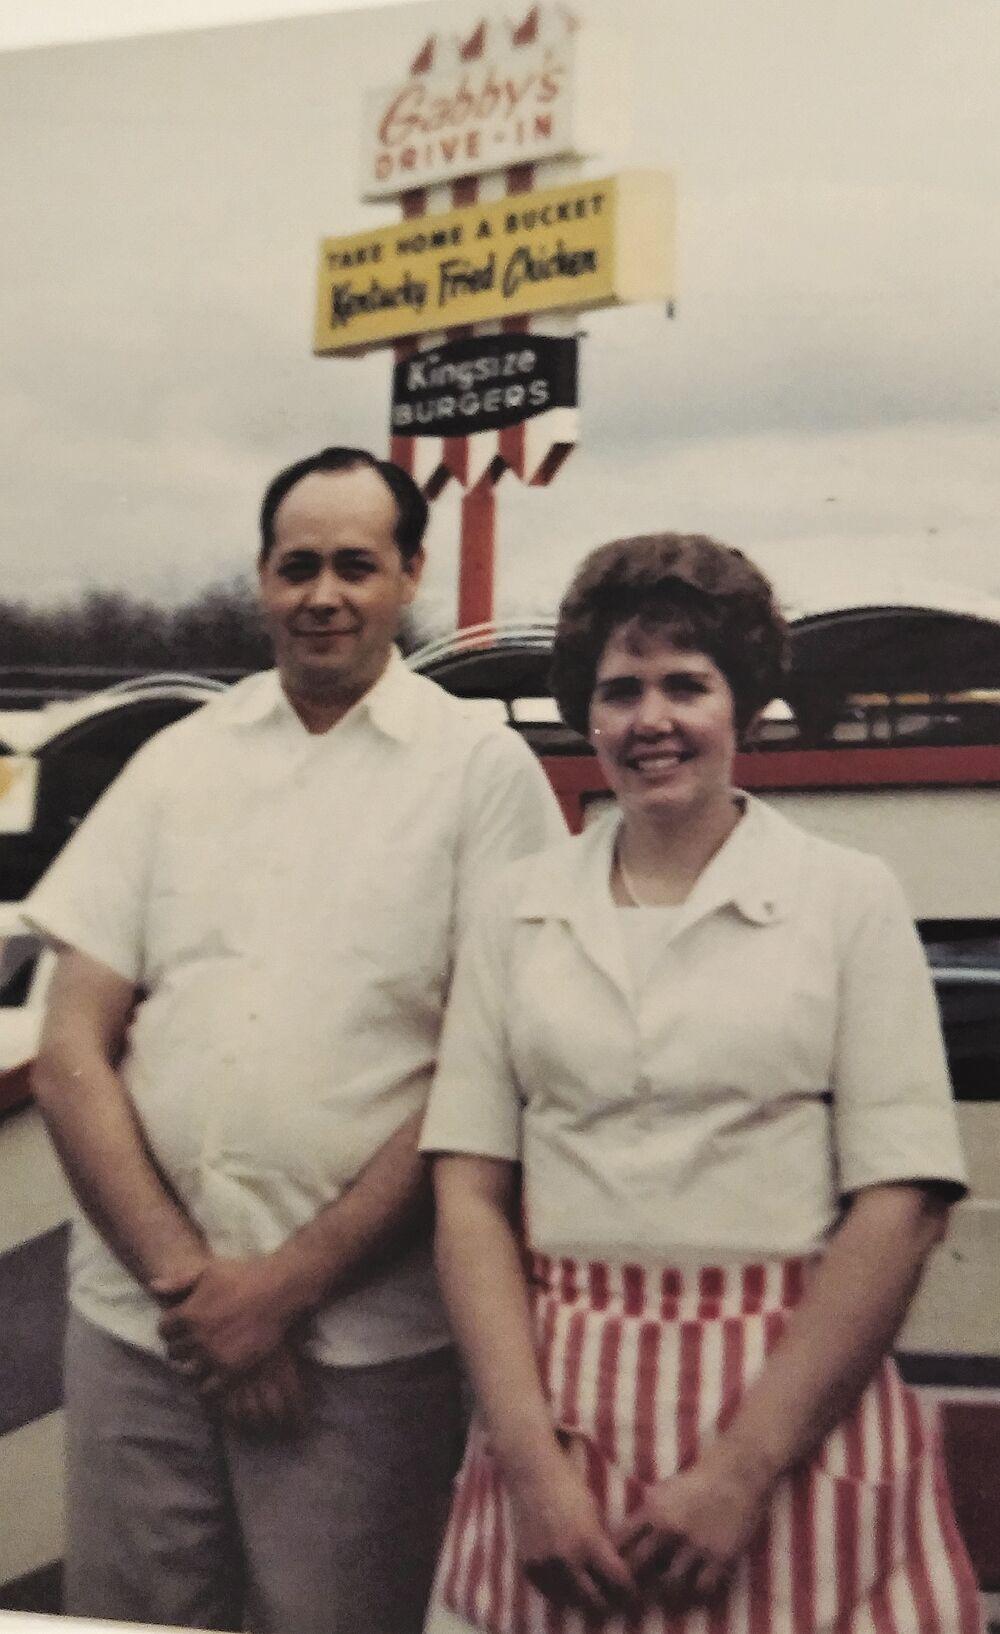 Bill and Bea Steele